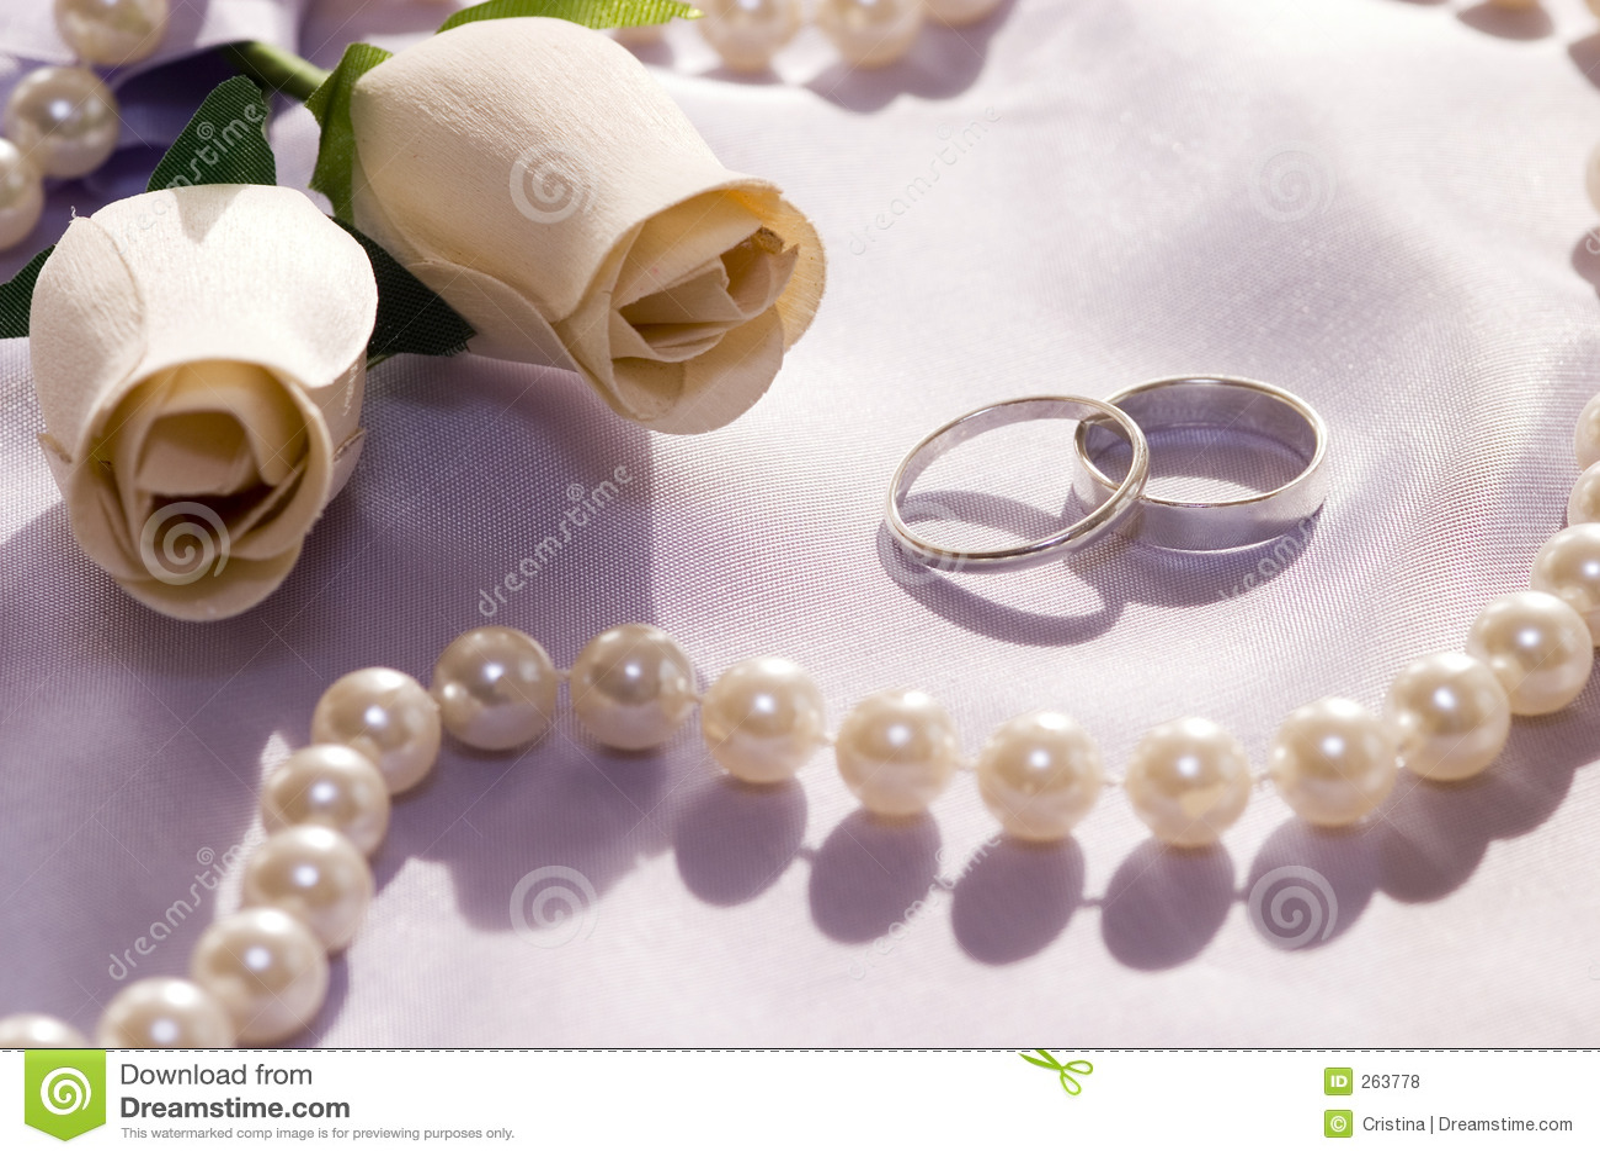 WEDDING STILL LIFE 2 Royalty Free Stock Photos - Image: 263778: www.dreamstime.com/royalty-free-stock-photos-wedding-still-life-2...